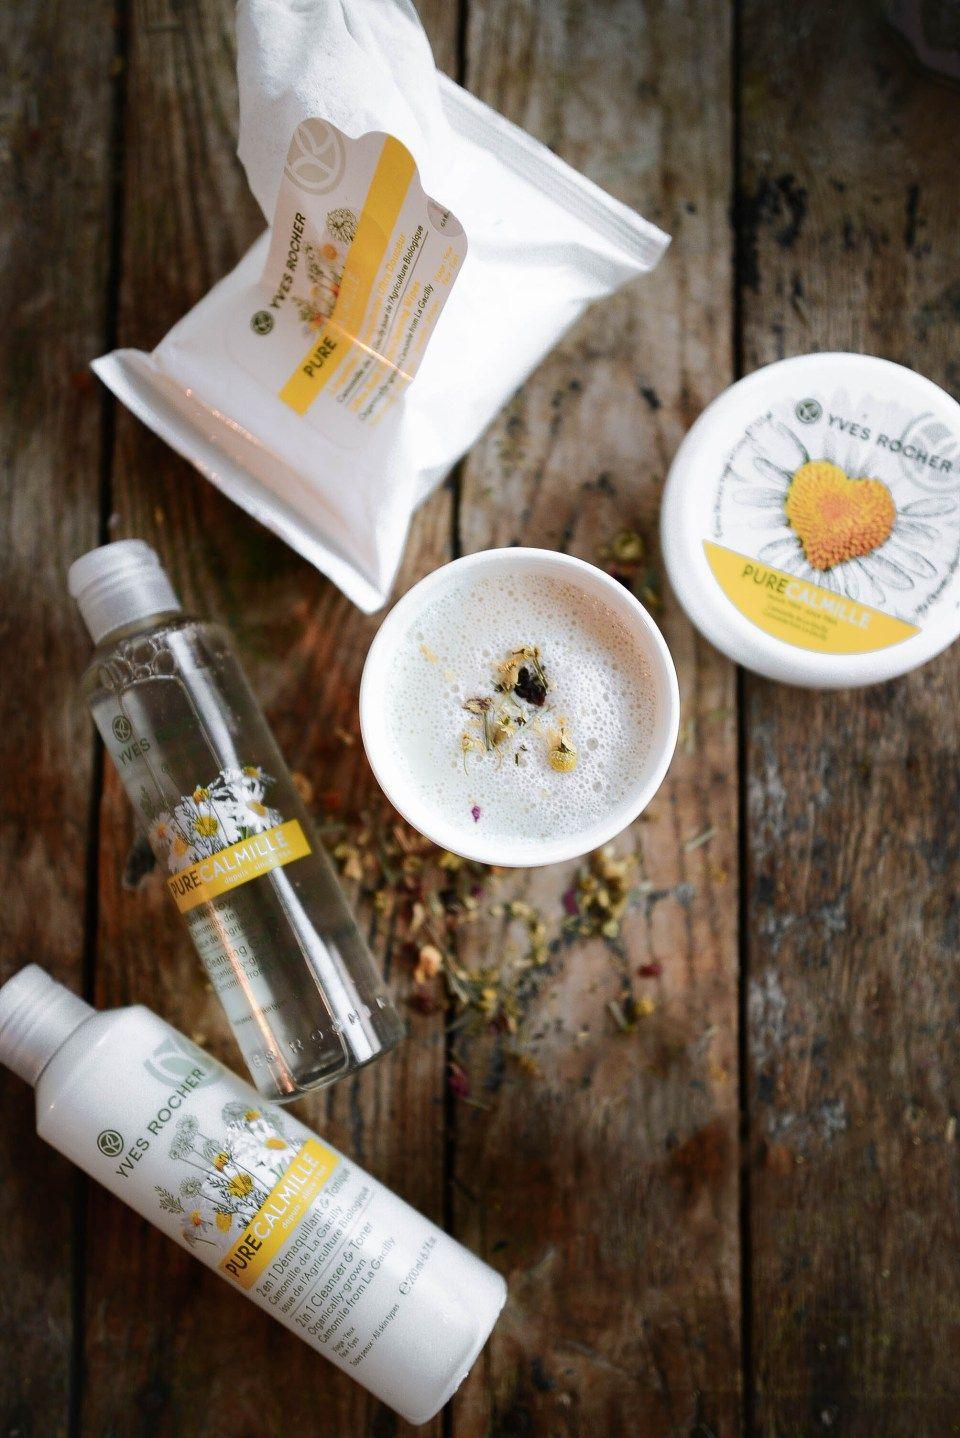 Yves Rocher Pure Calmille Product Line Camomile Tea Latte Recipe